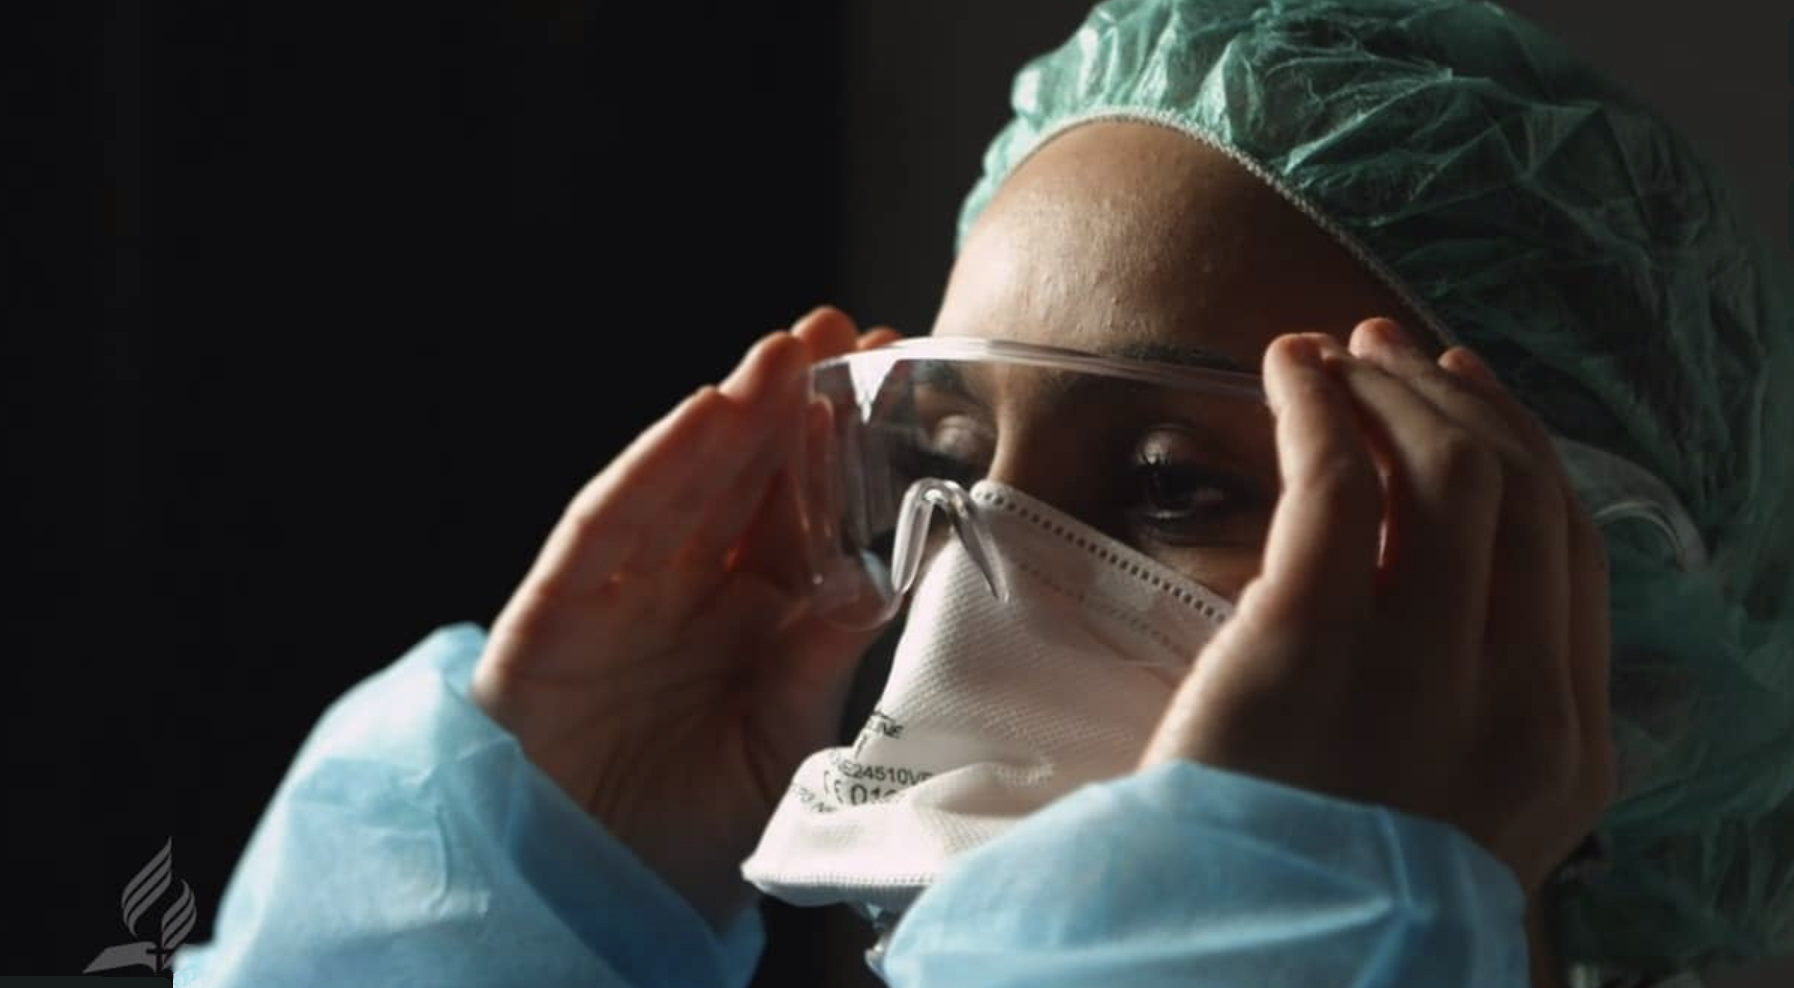 Dear Coronavirus screen shot of medical worker